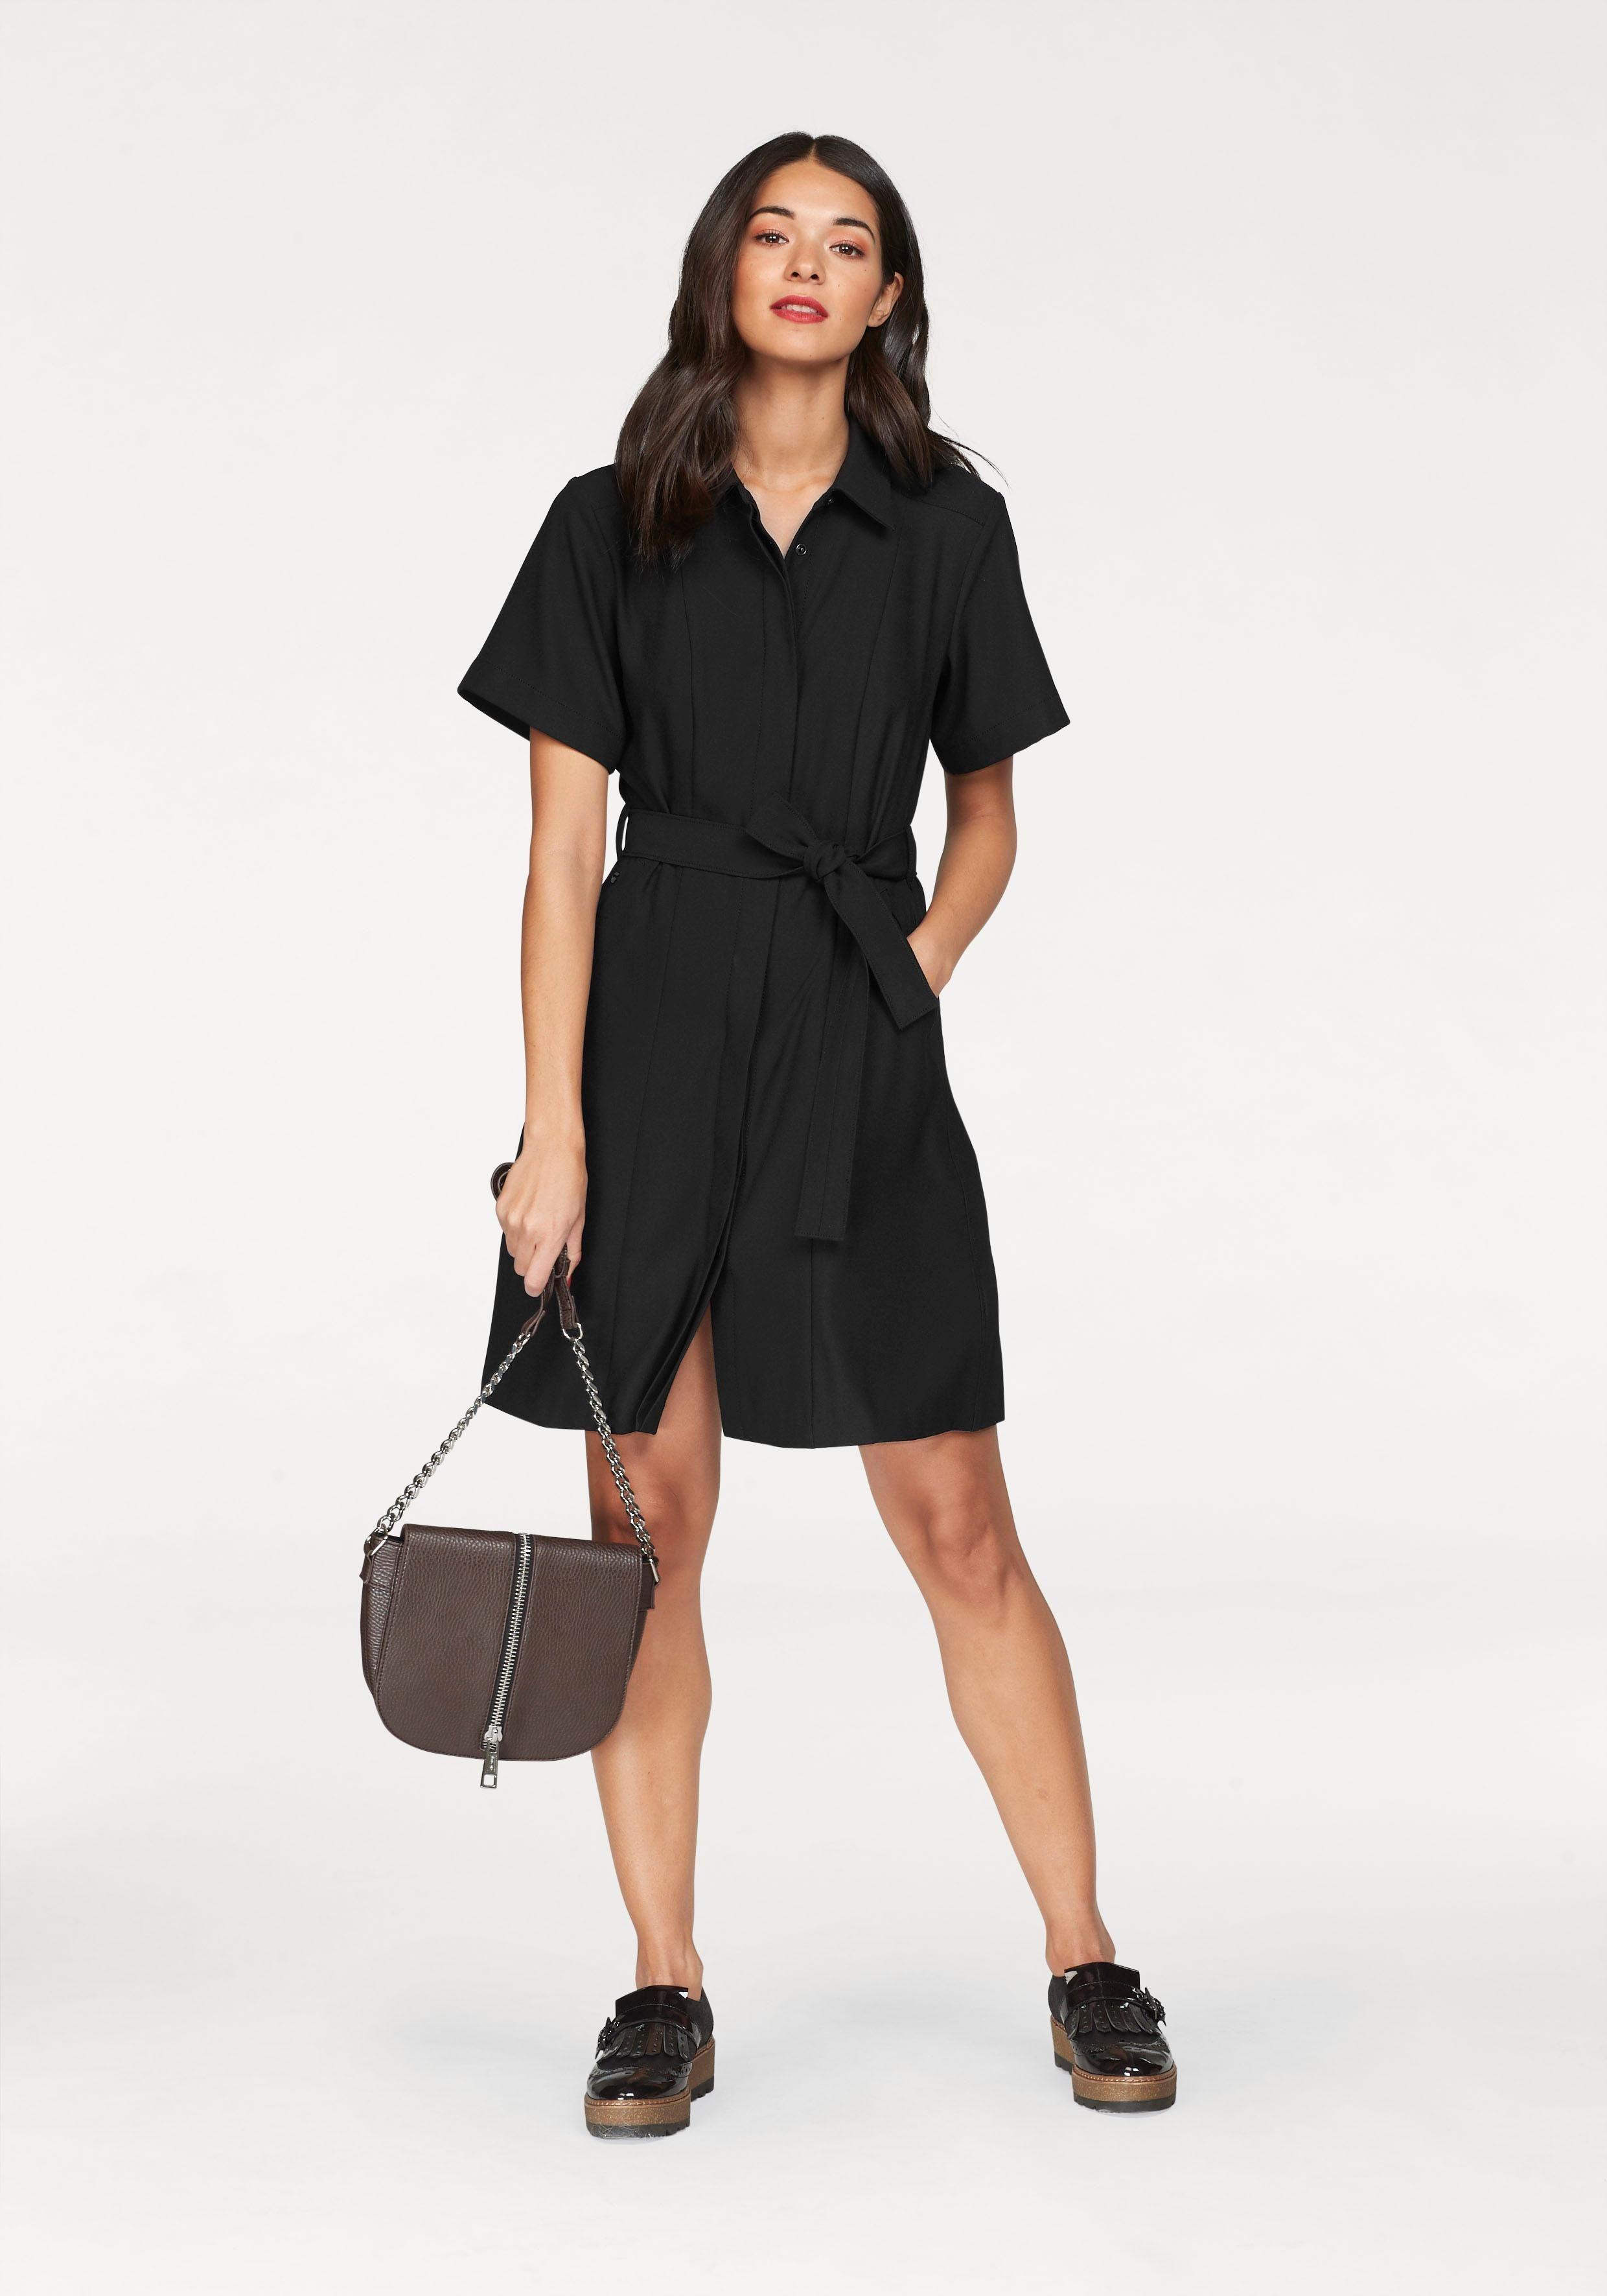 Shirt Star »bronson Dc Raw G Verkrijgbaar Dress« Blousejurkje Online 7qawXHWZH1